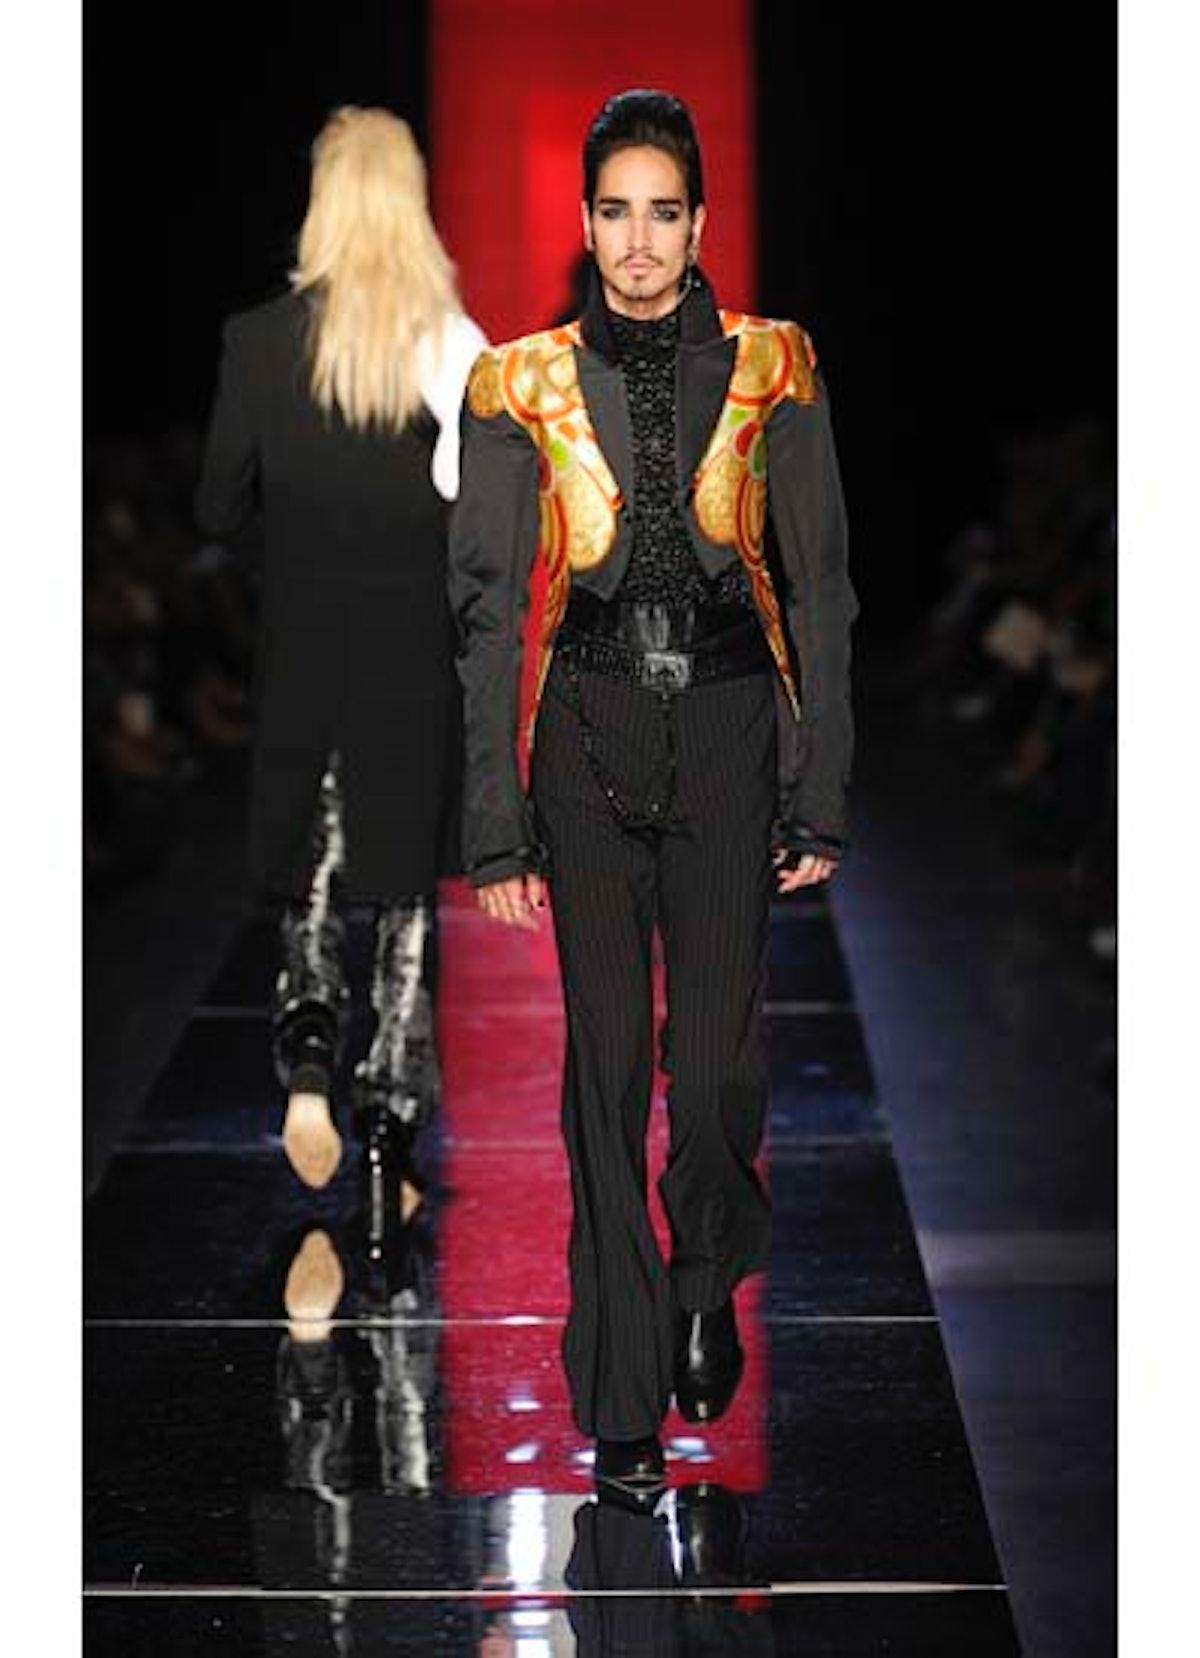 fass-jean-paul-gaultier-couture-2012-runway-40-v.jpg